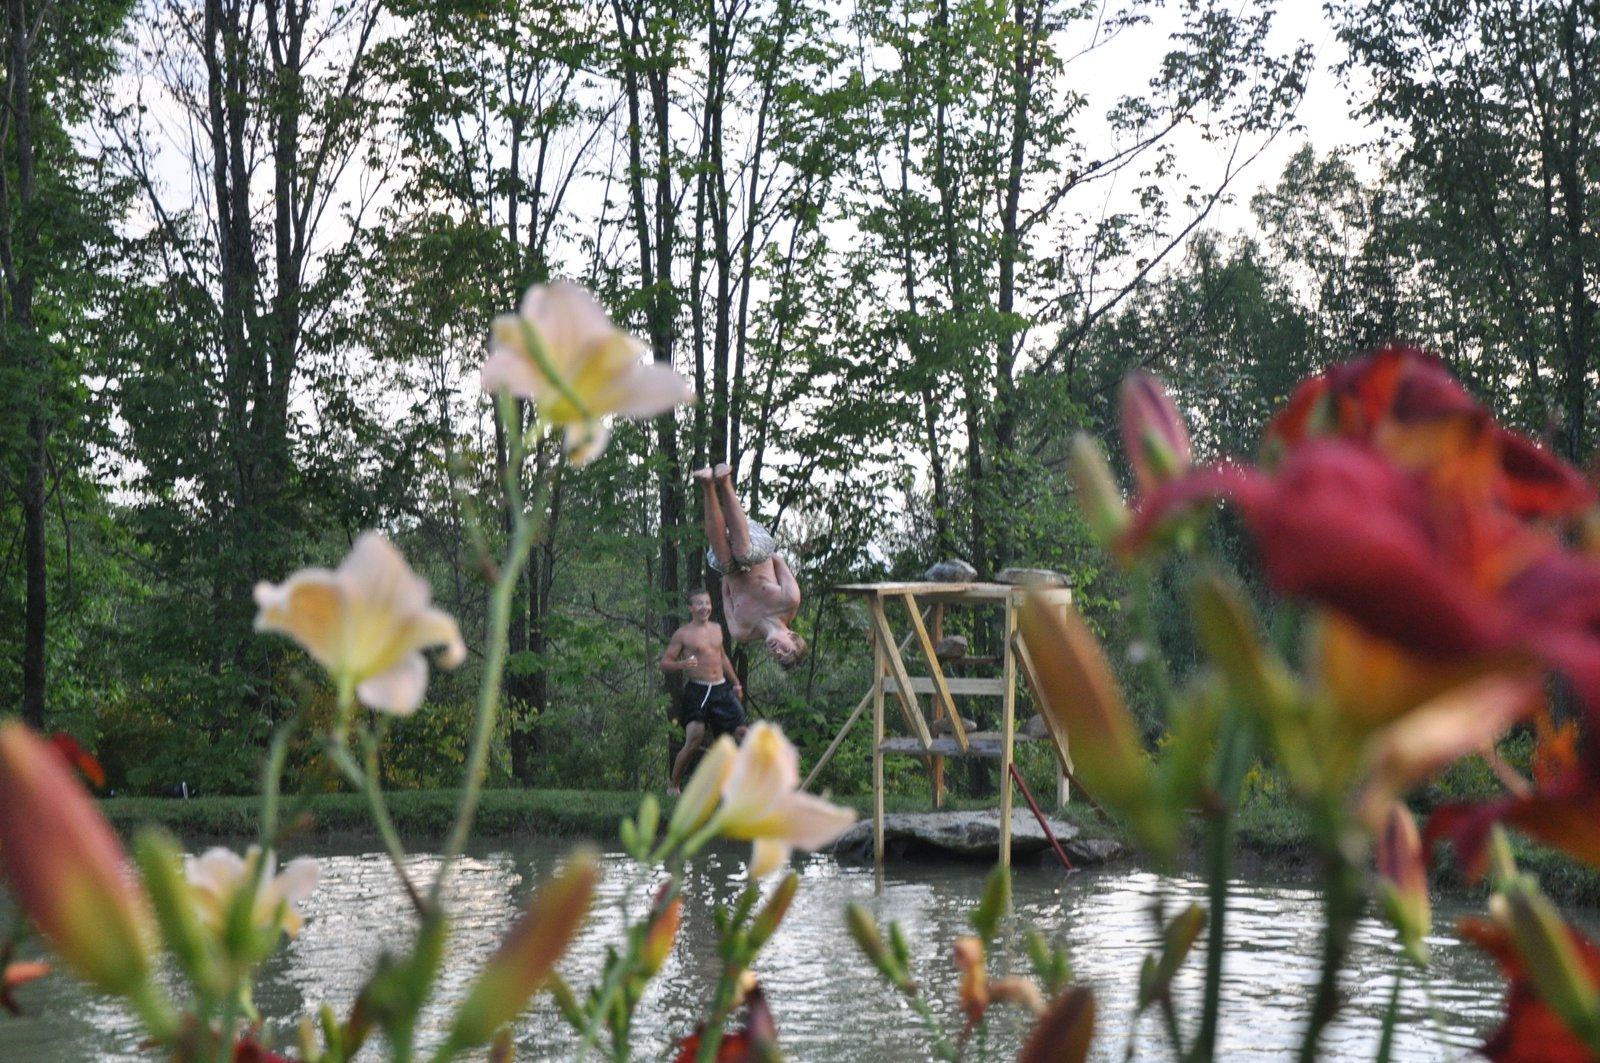 New diving platform thing.